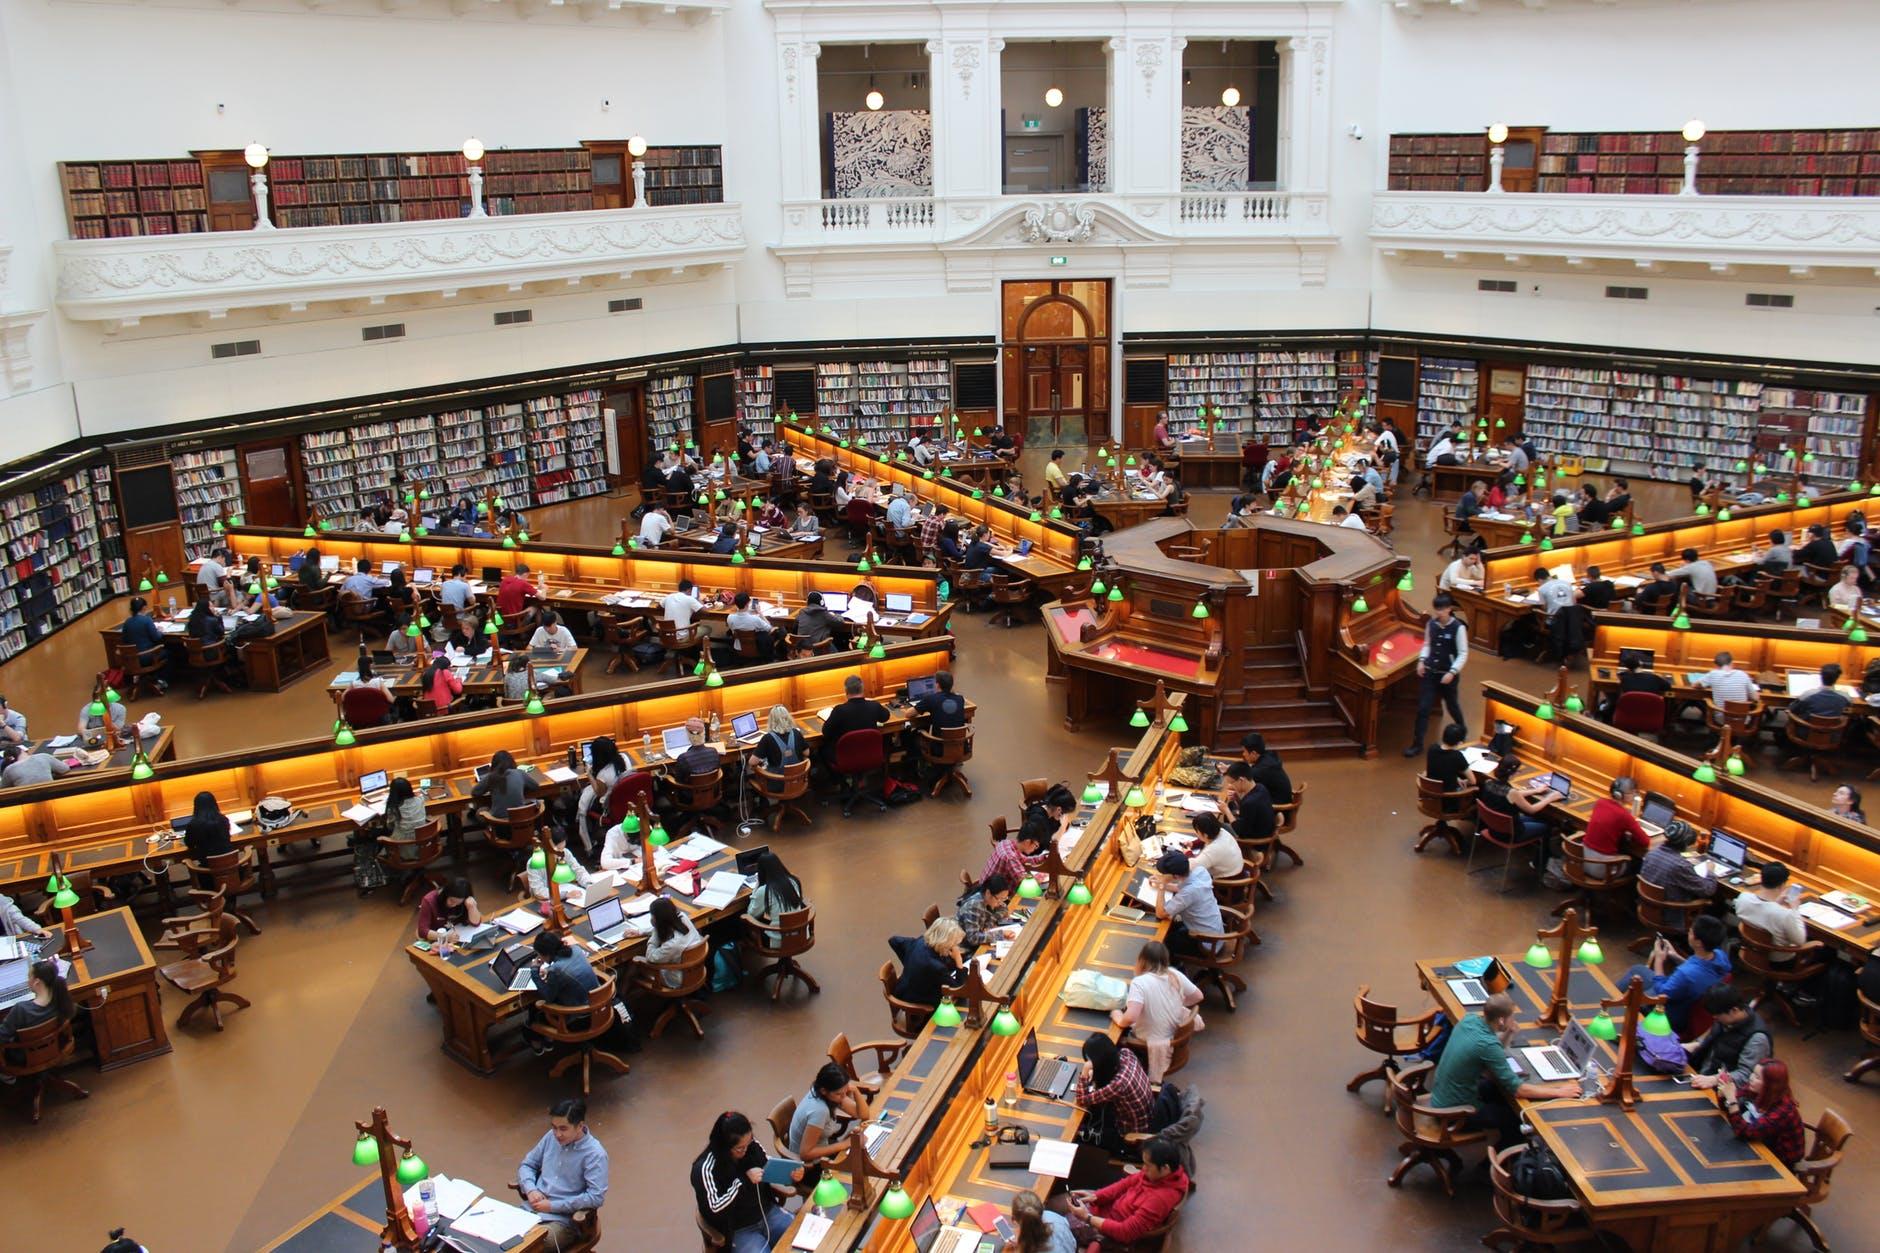 Library la trobe study students 159740